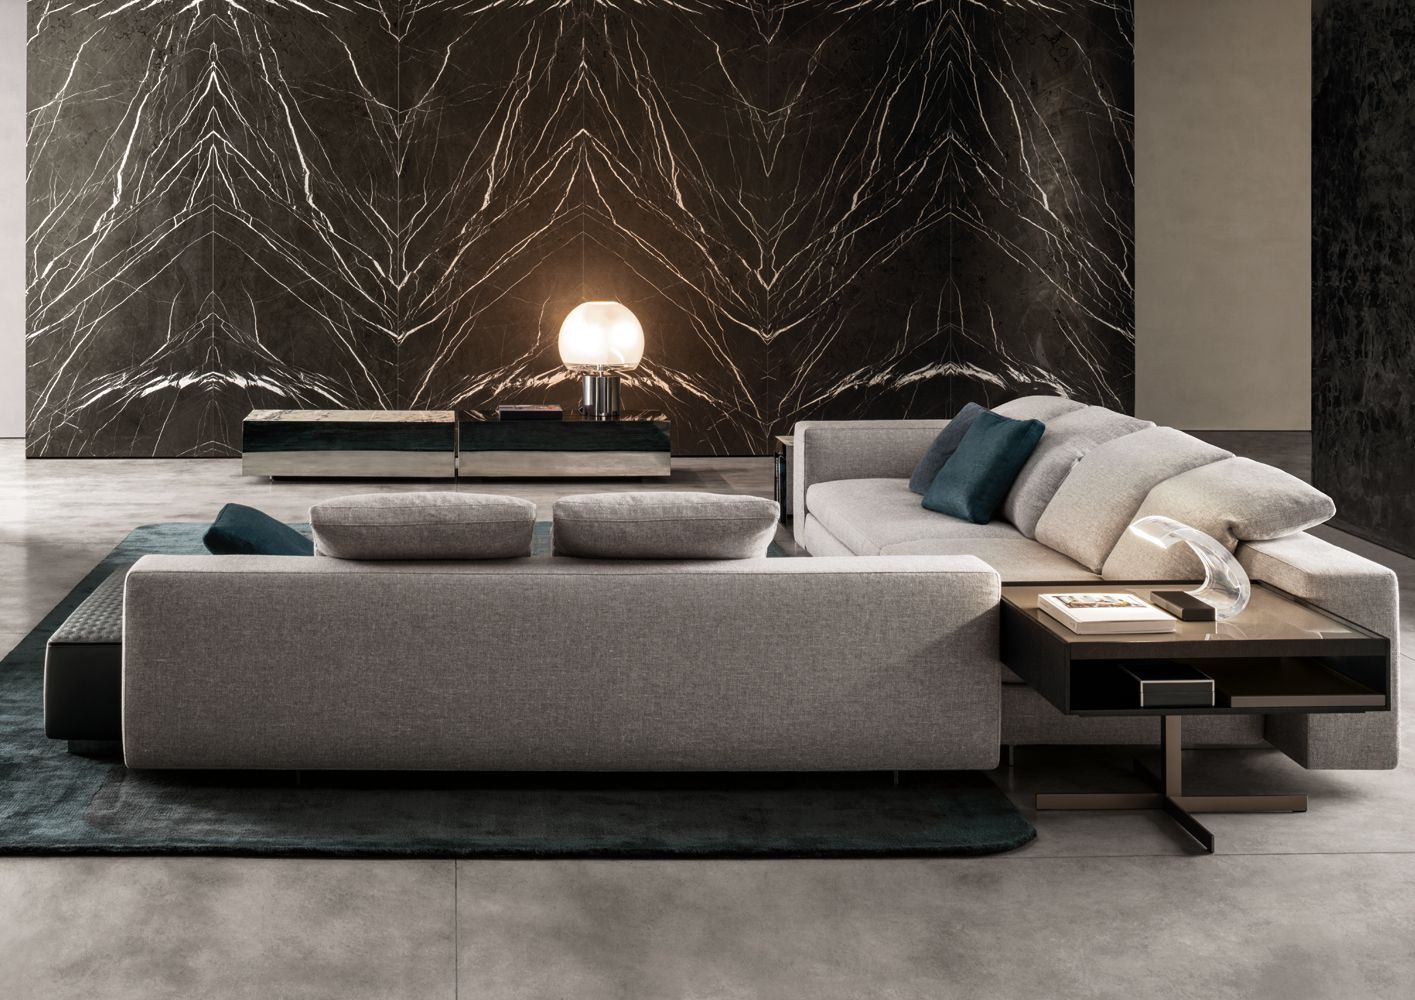 Yang Modular Sofa Minotti - Milia Shop | INTERIOR DESIGN | Pinterest |  Modular sofa, Interiors and Counselling room